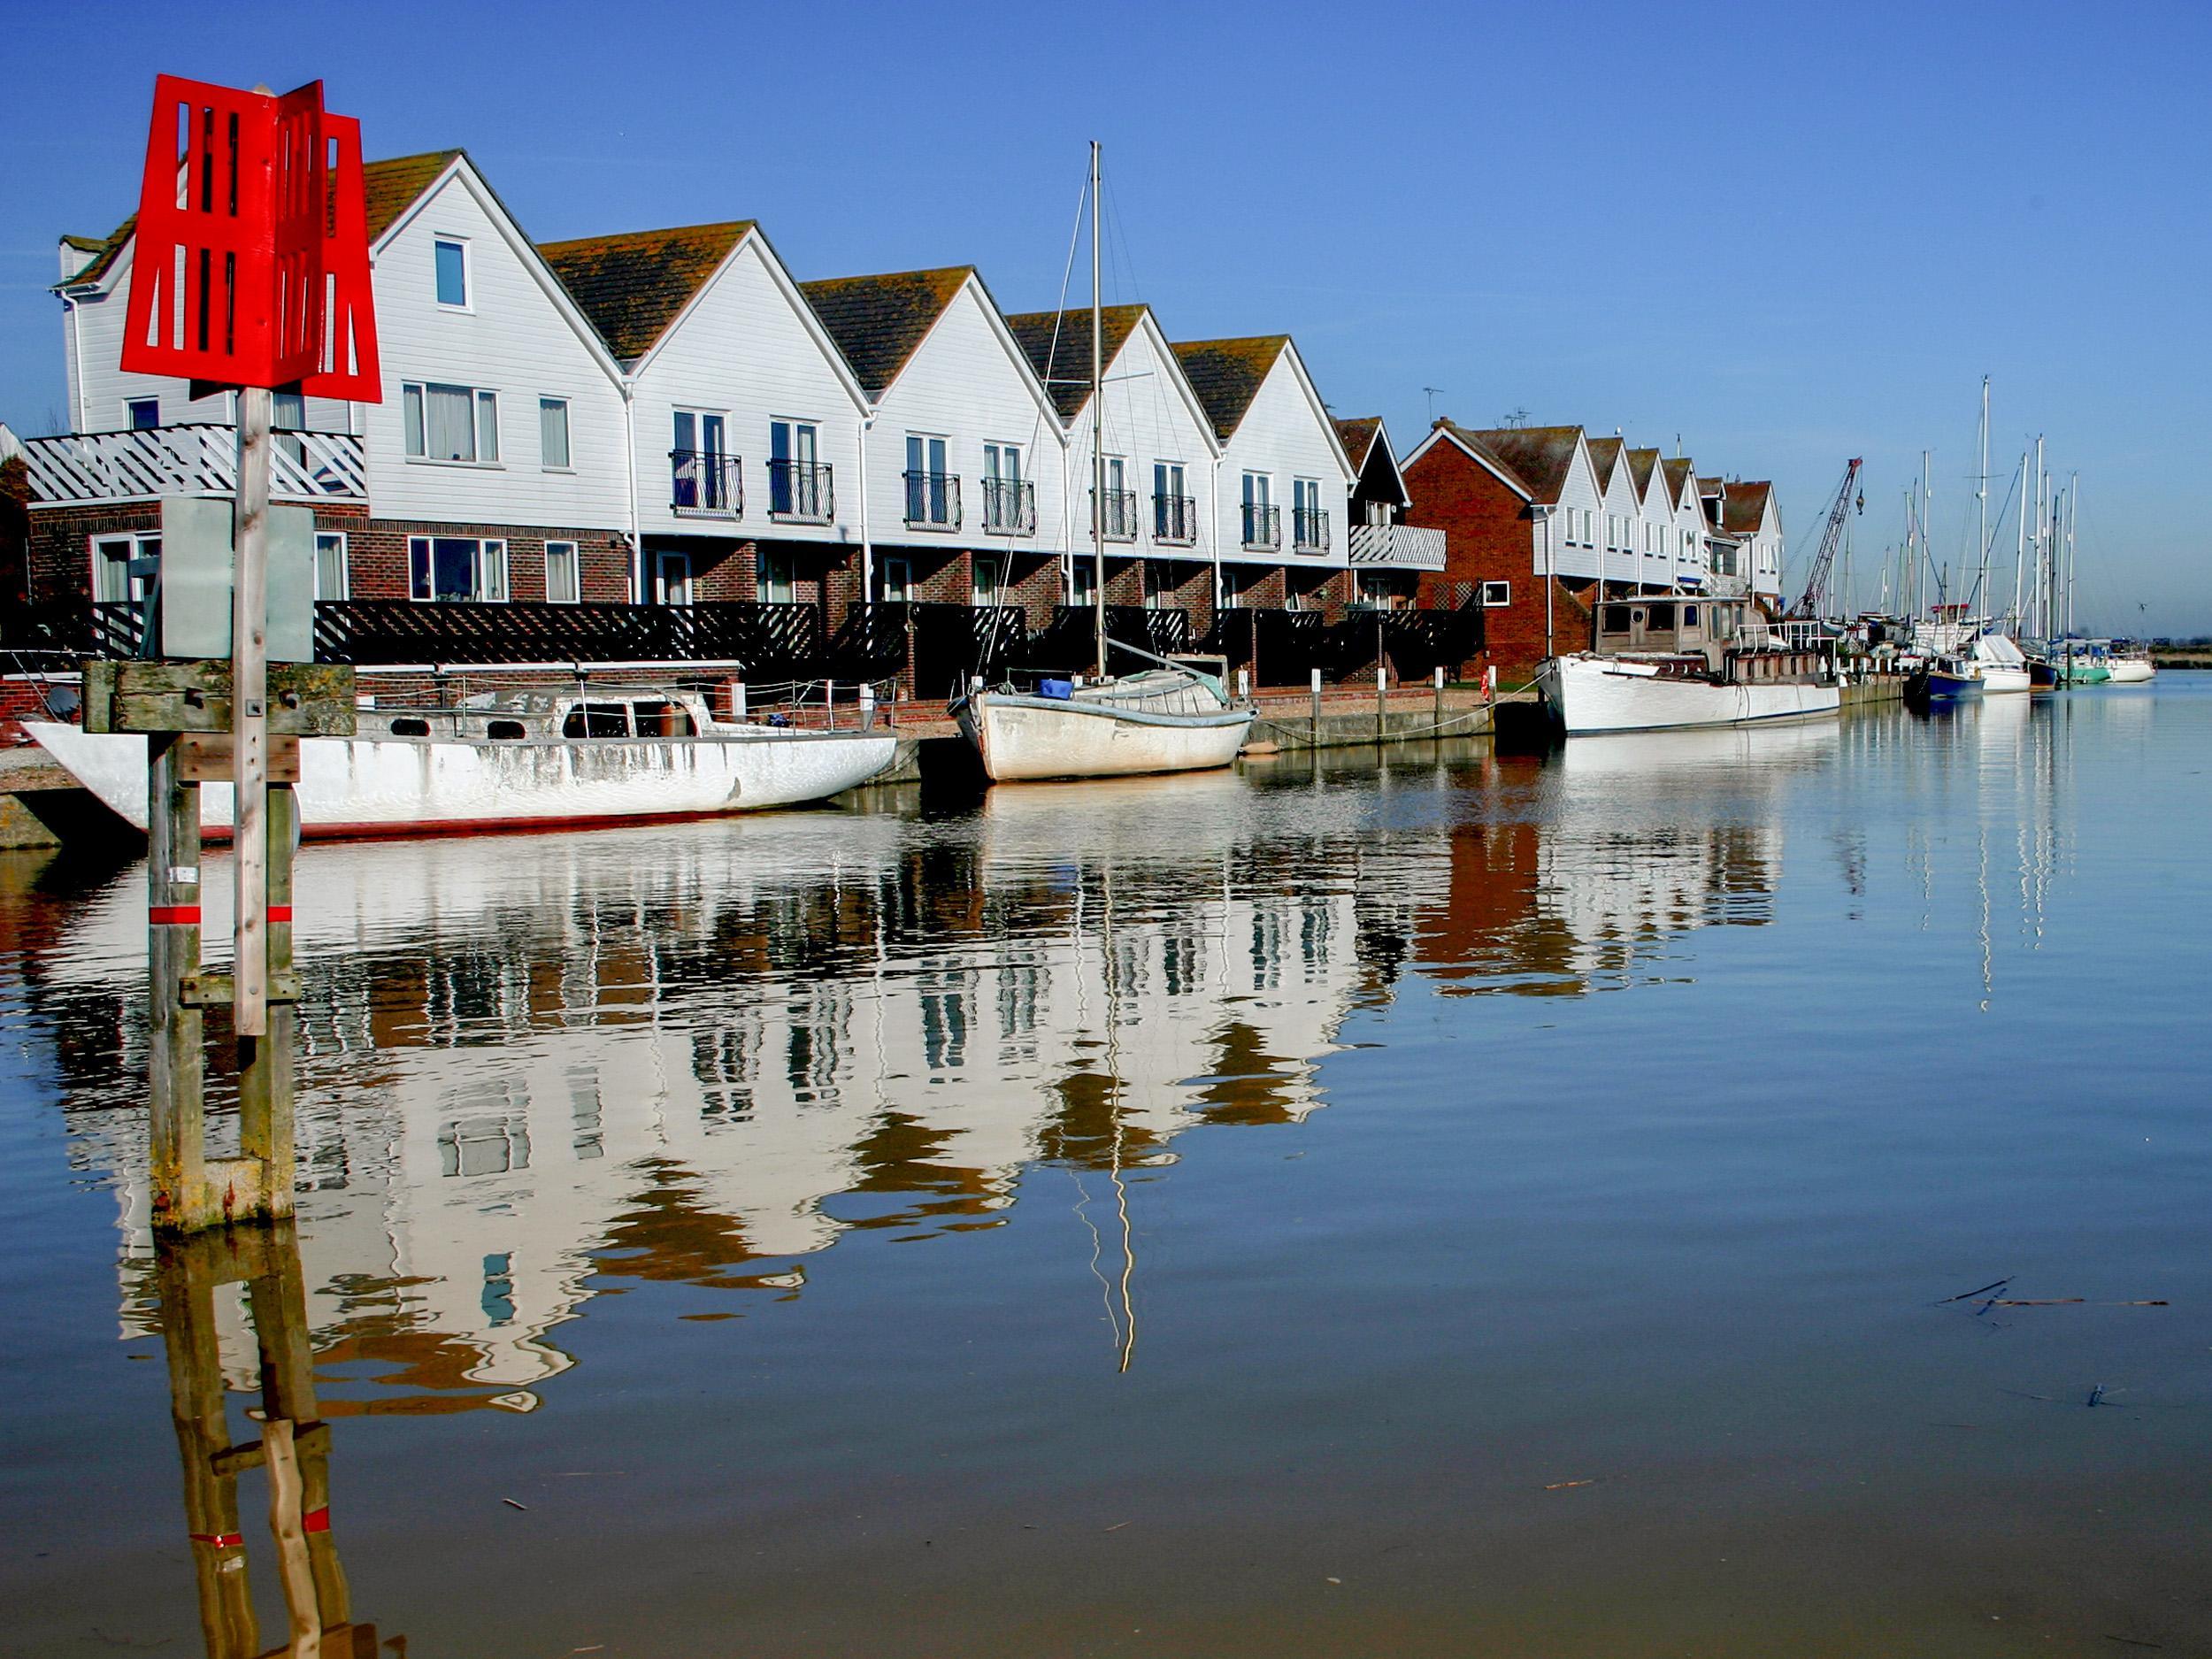 17 The Boathouse